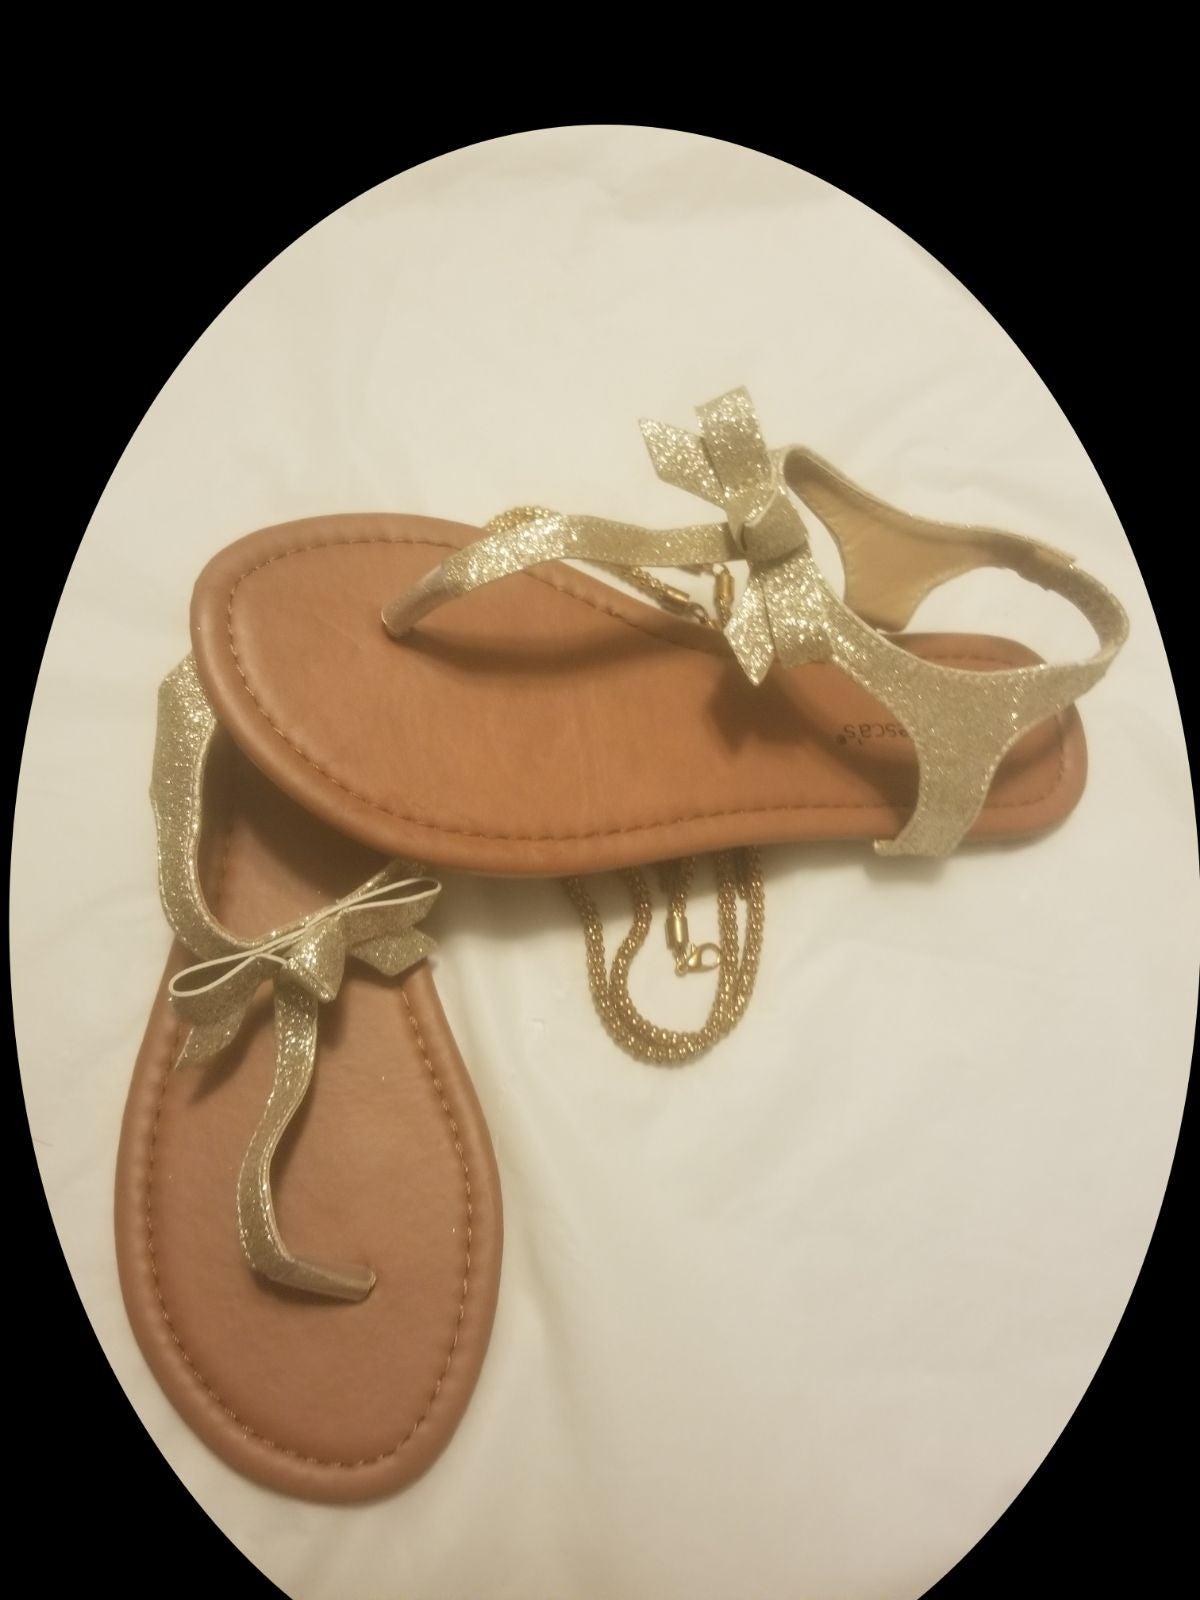 SALE! Golden Boe Sandals